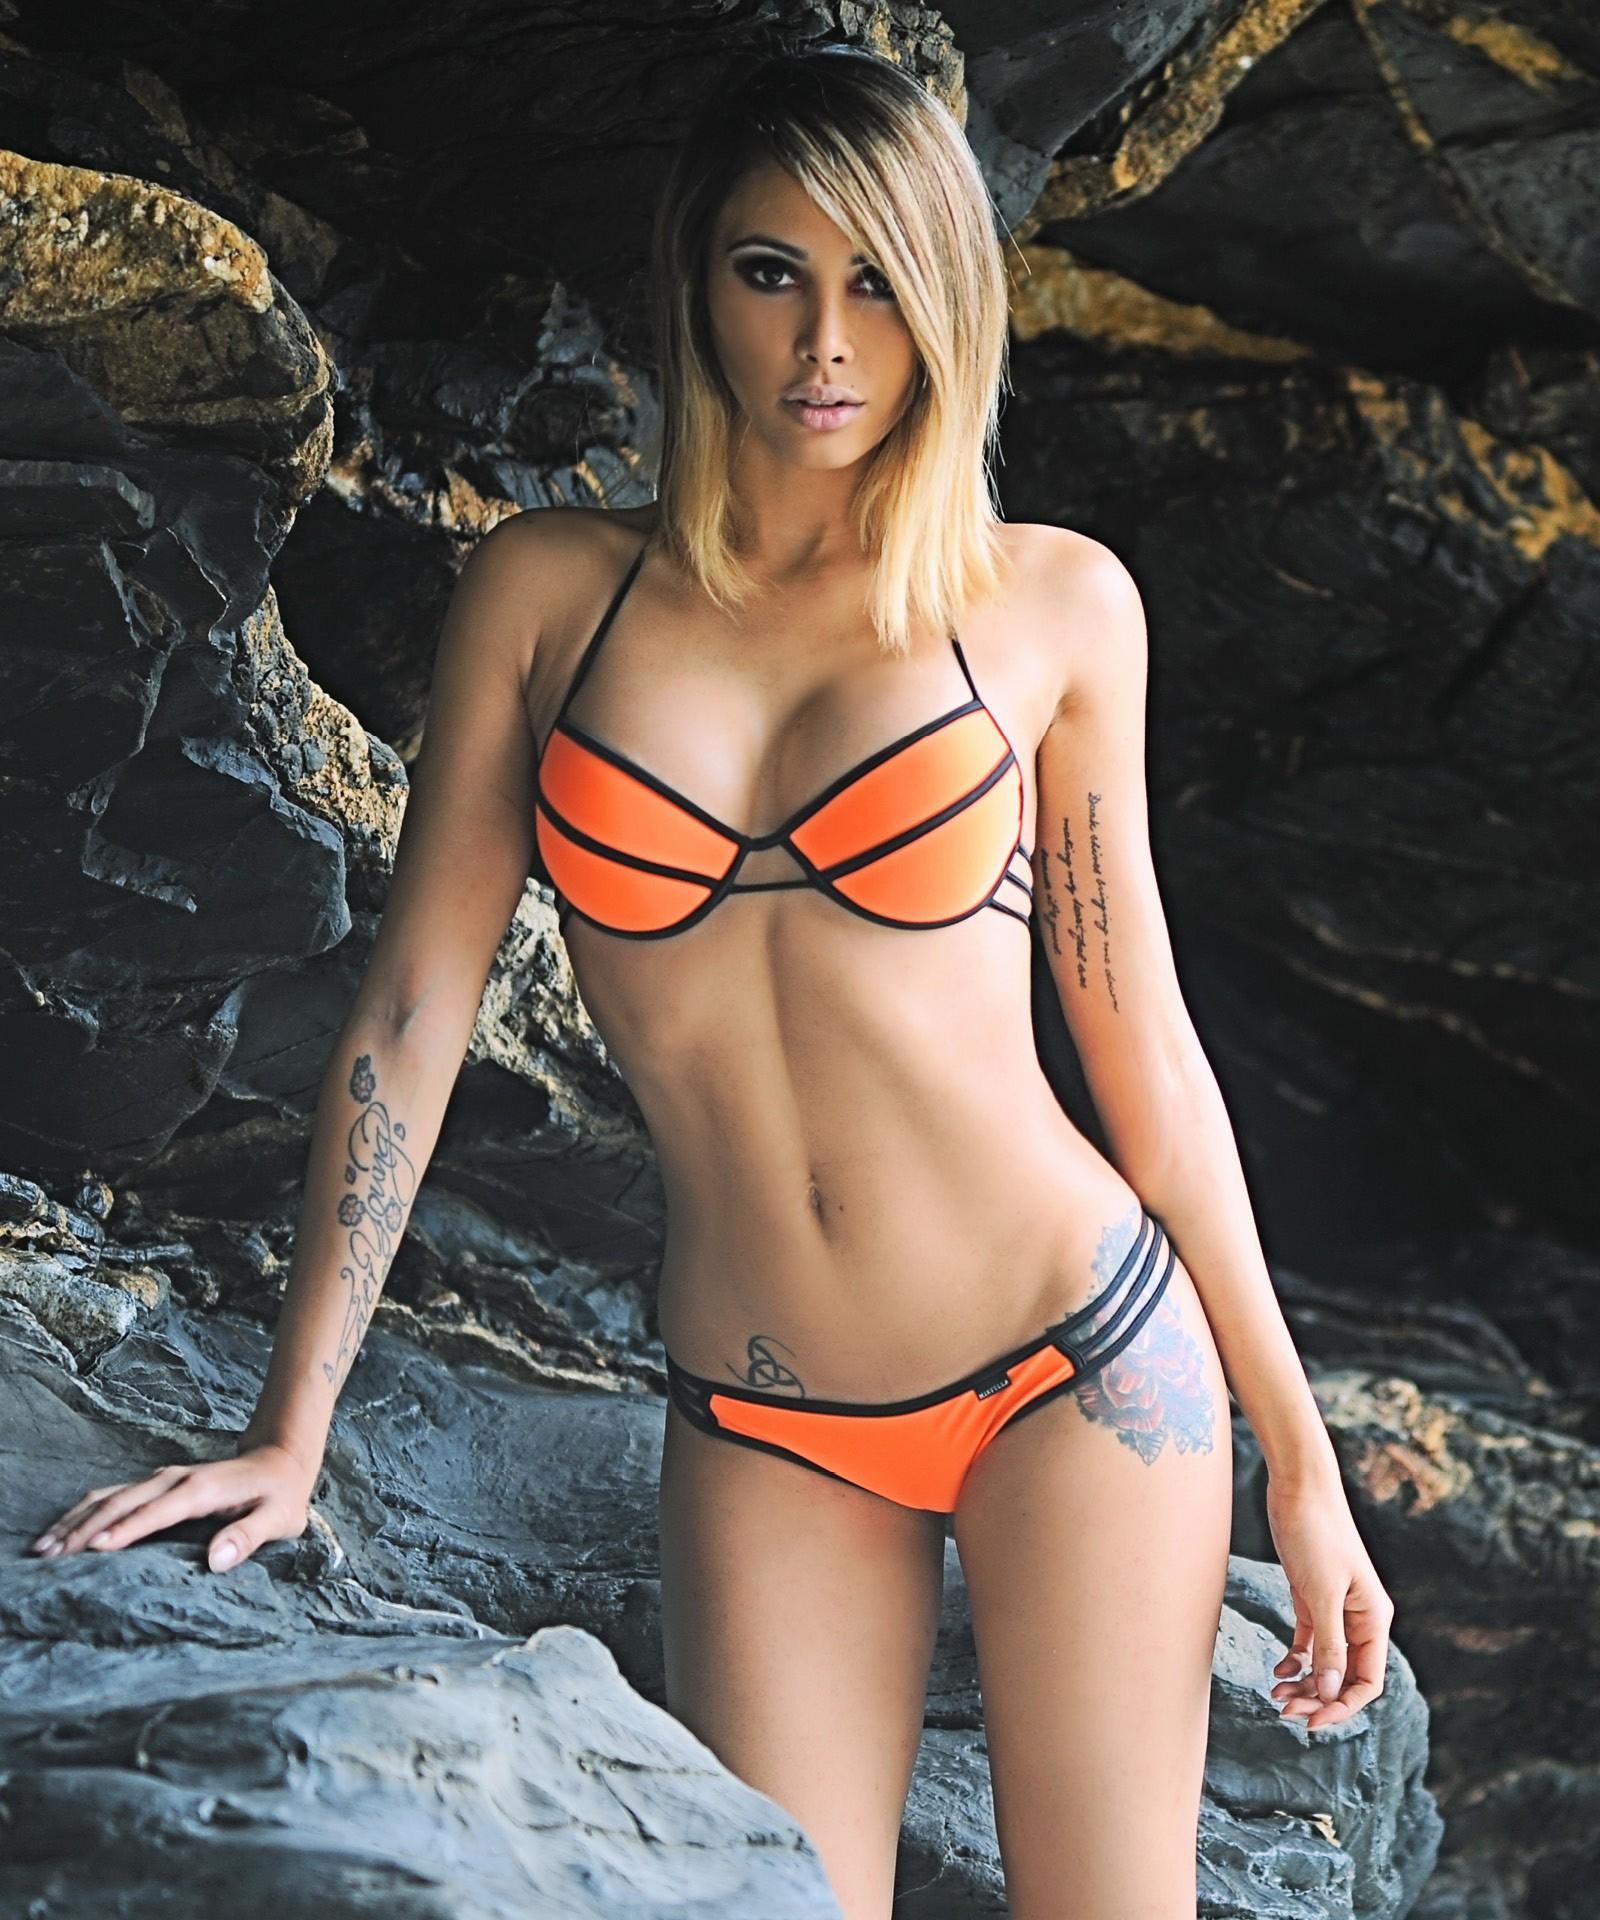 Berzèro Arancio